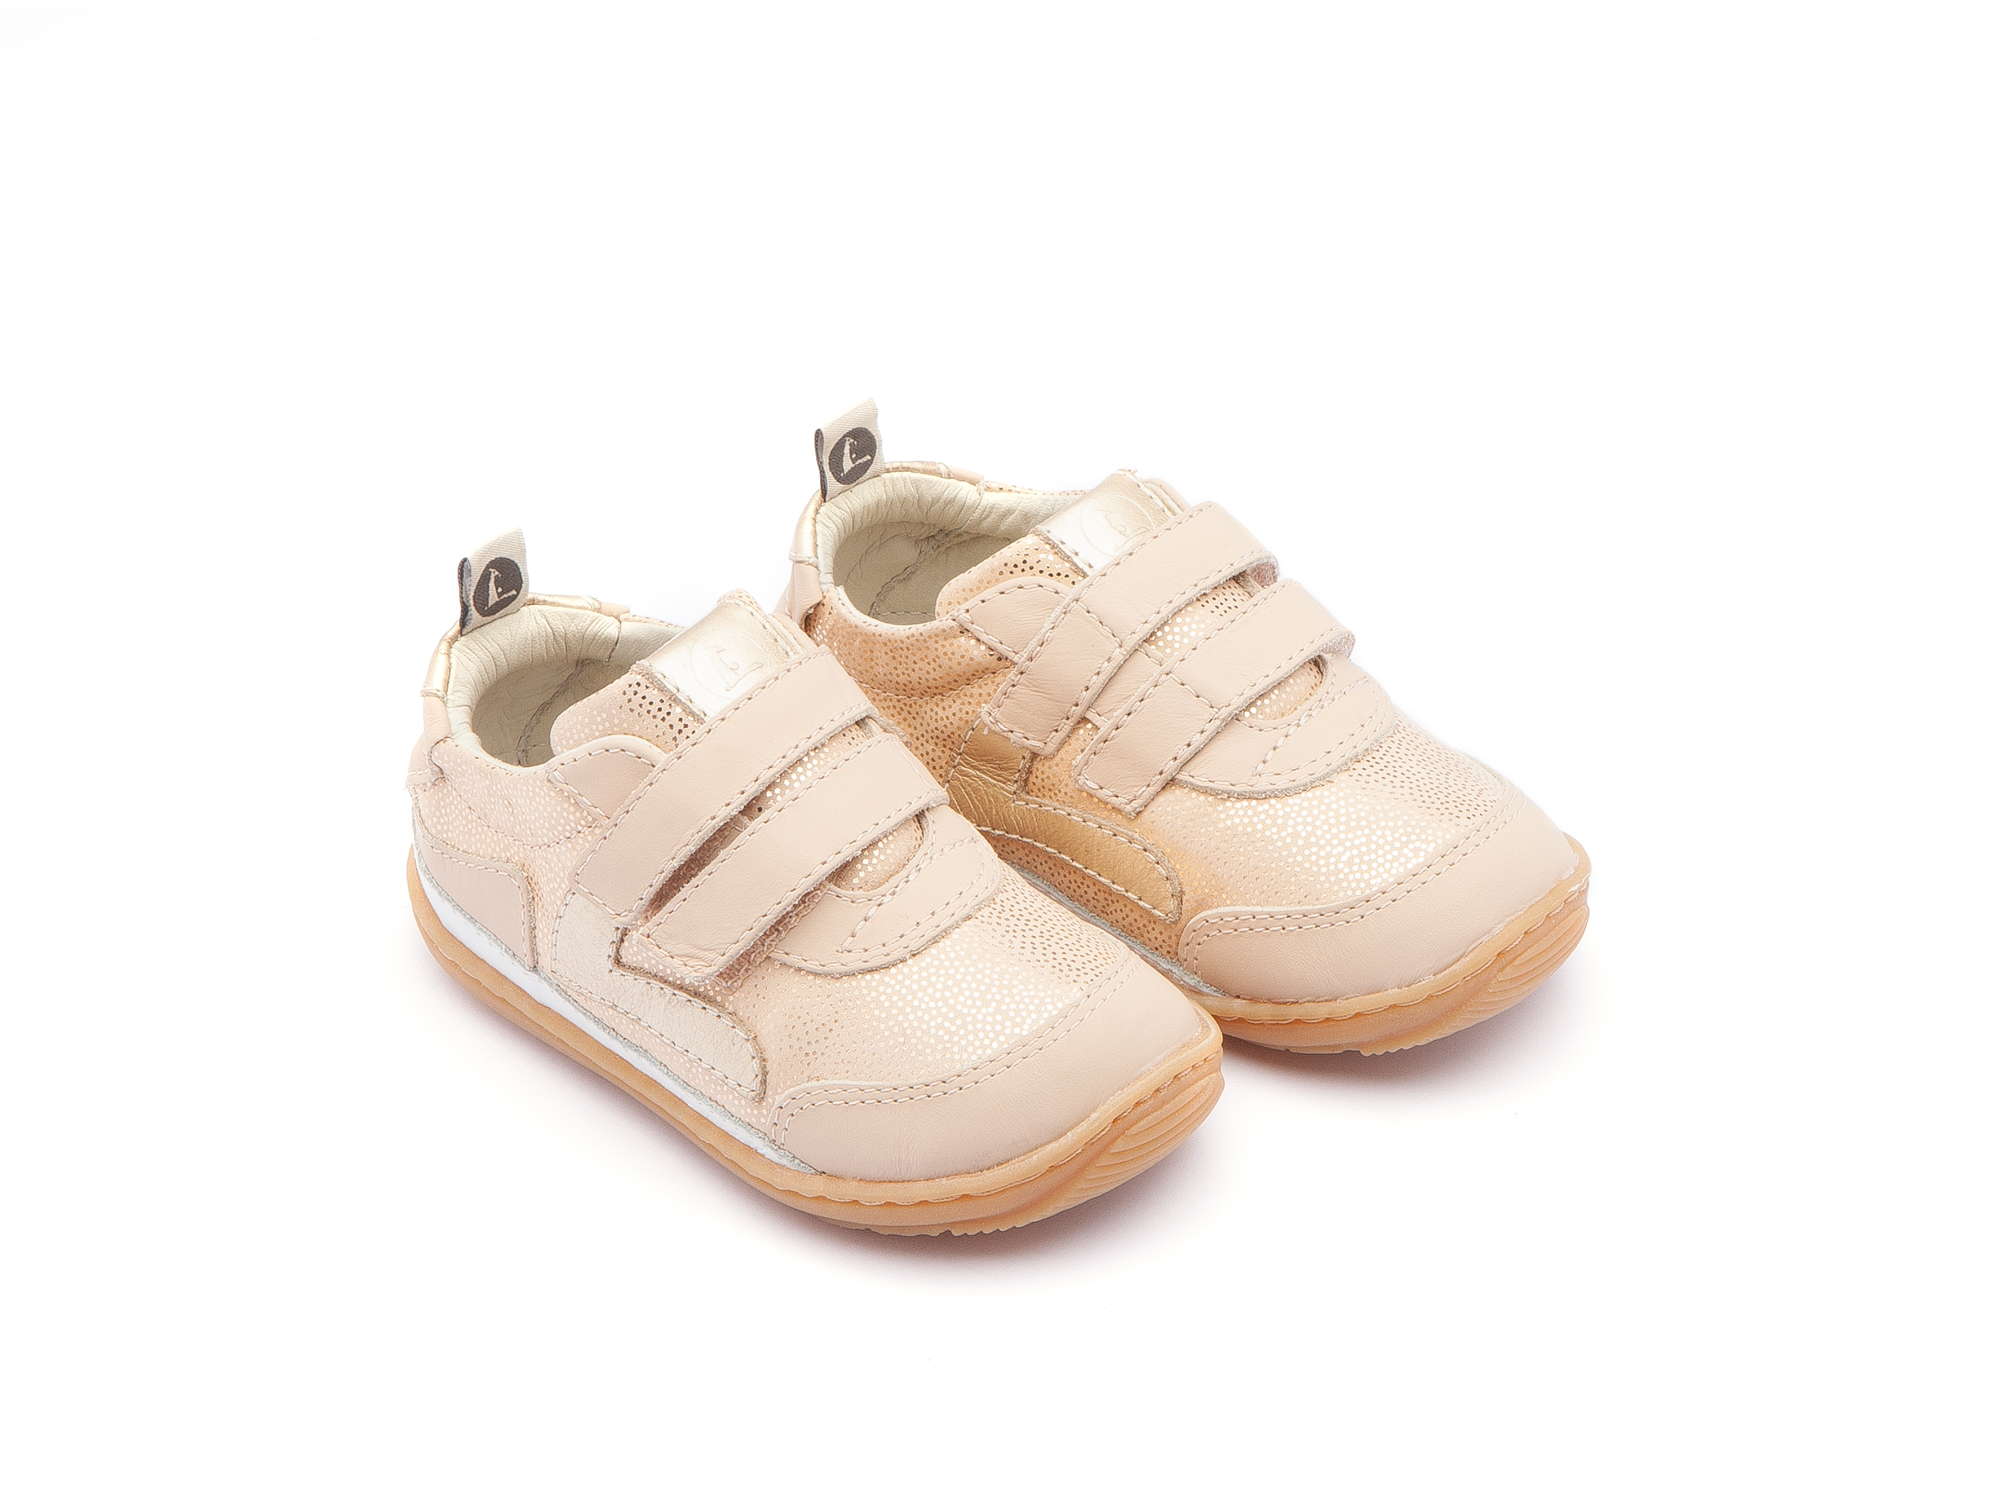 Sneaker Casual Jumpy Golden Sugar/ Yogurt Baby 0 à 2 anos - 0